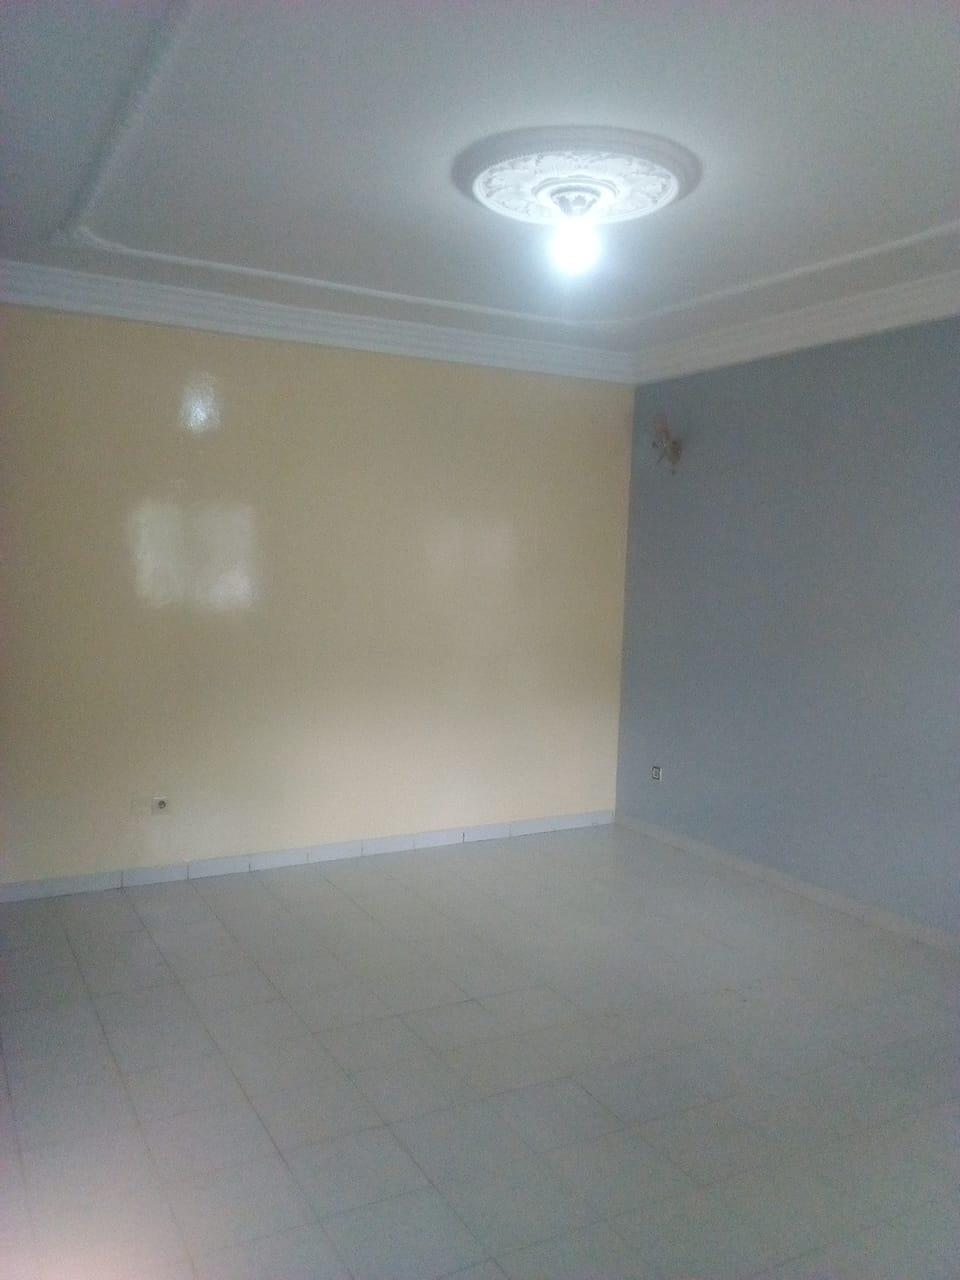 Apartment to rent - Yaoundé, Mbankolo, pas loin du carrefour golf - 1 living room(s), 2 bedroom(s), 1 bathroom(s) - 150 000 FCFA / month